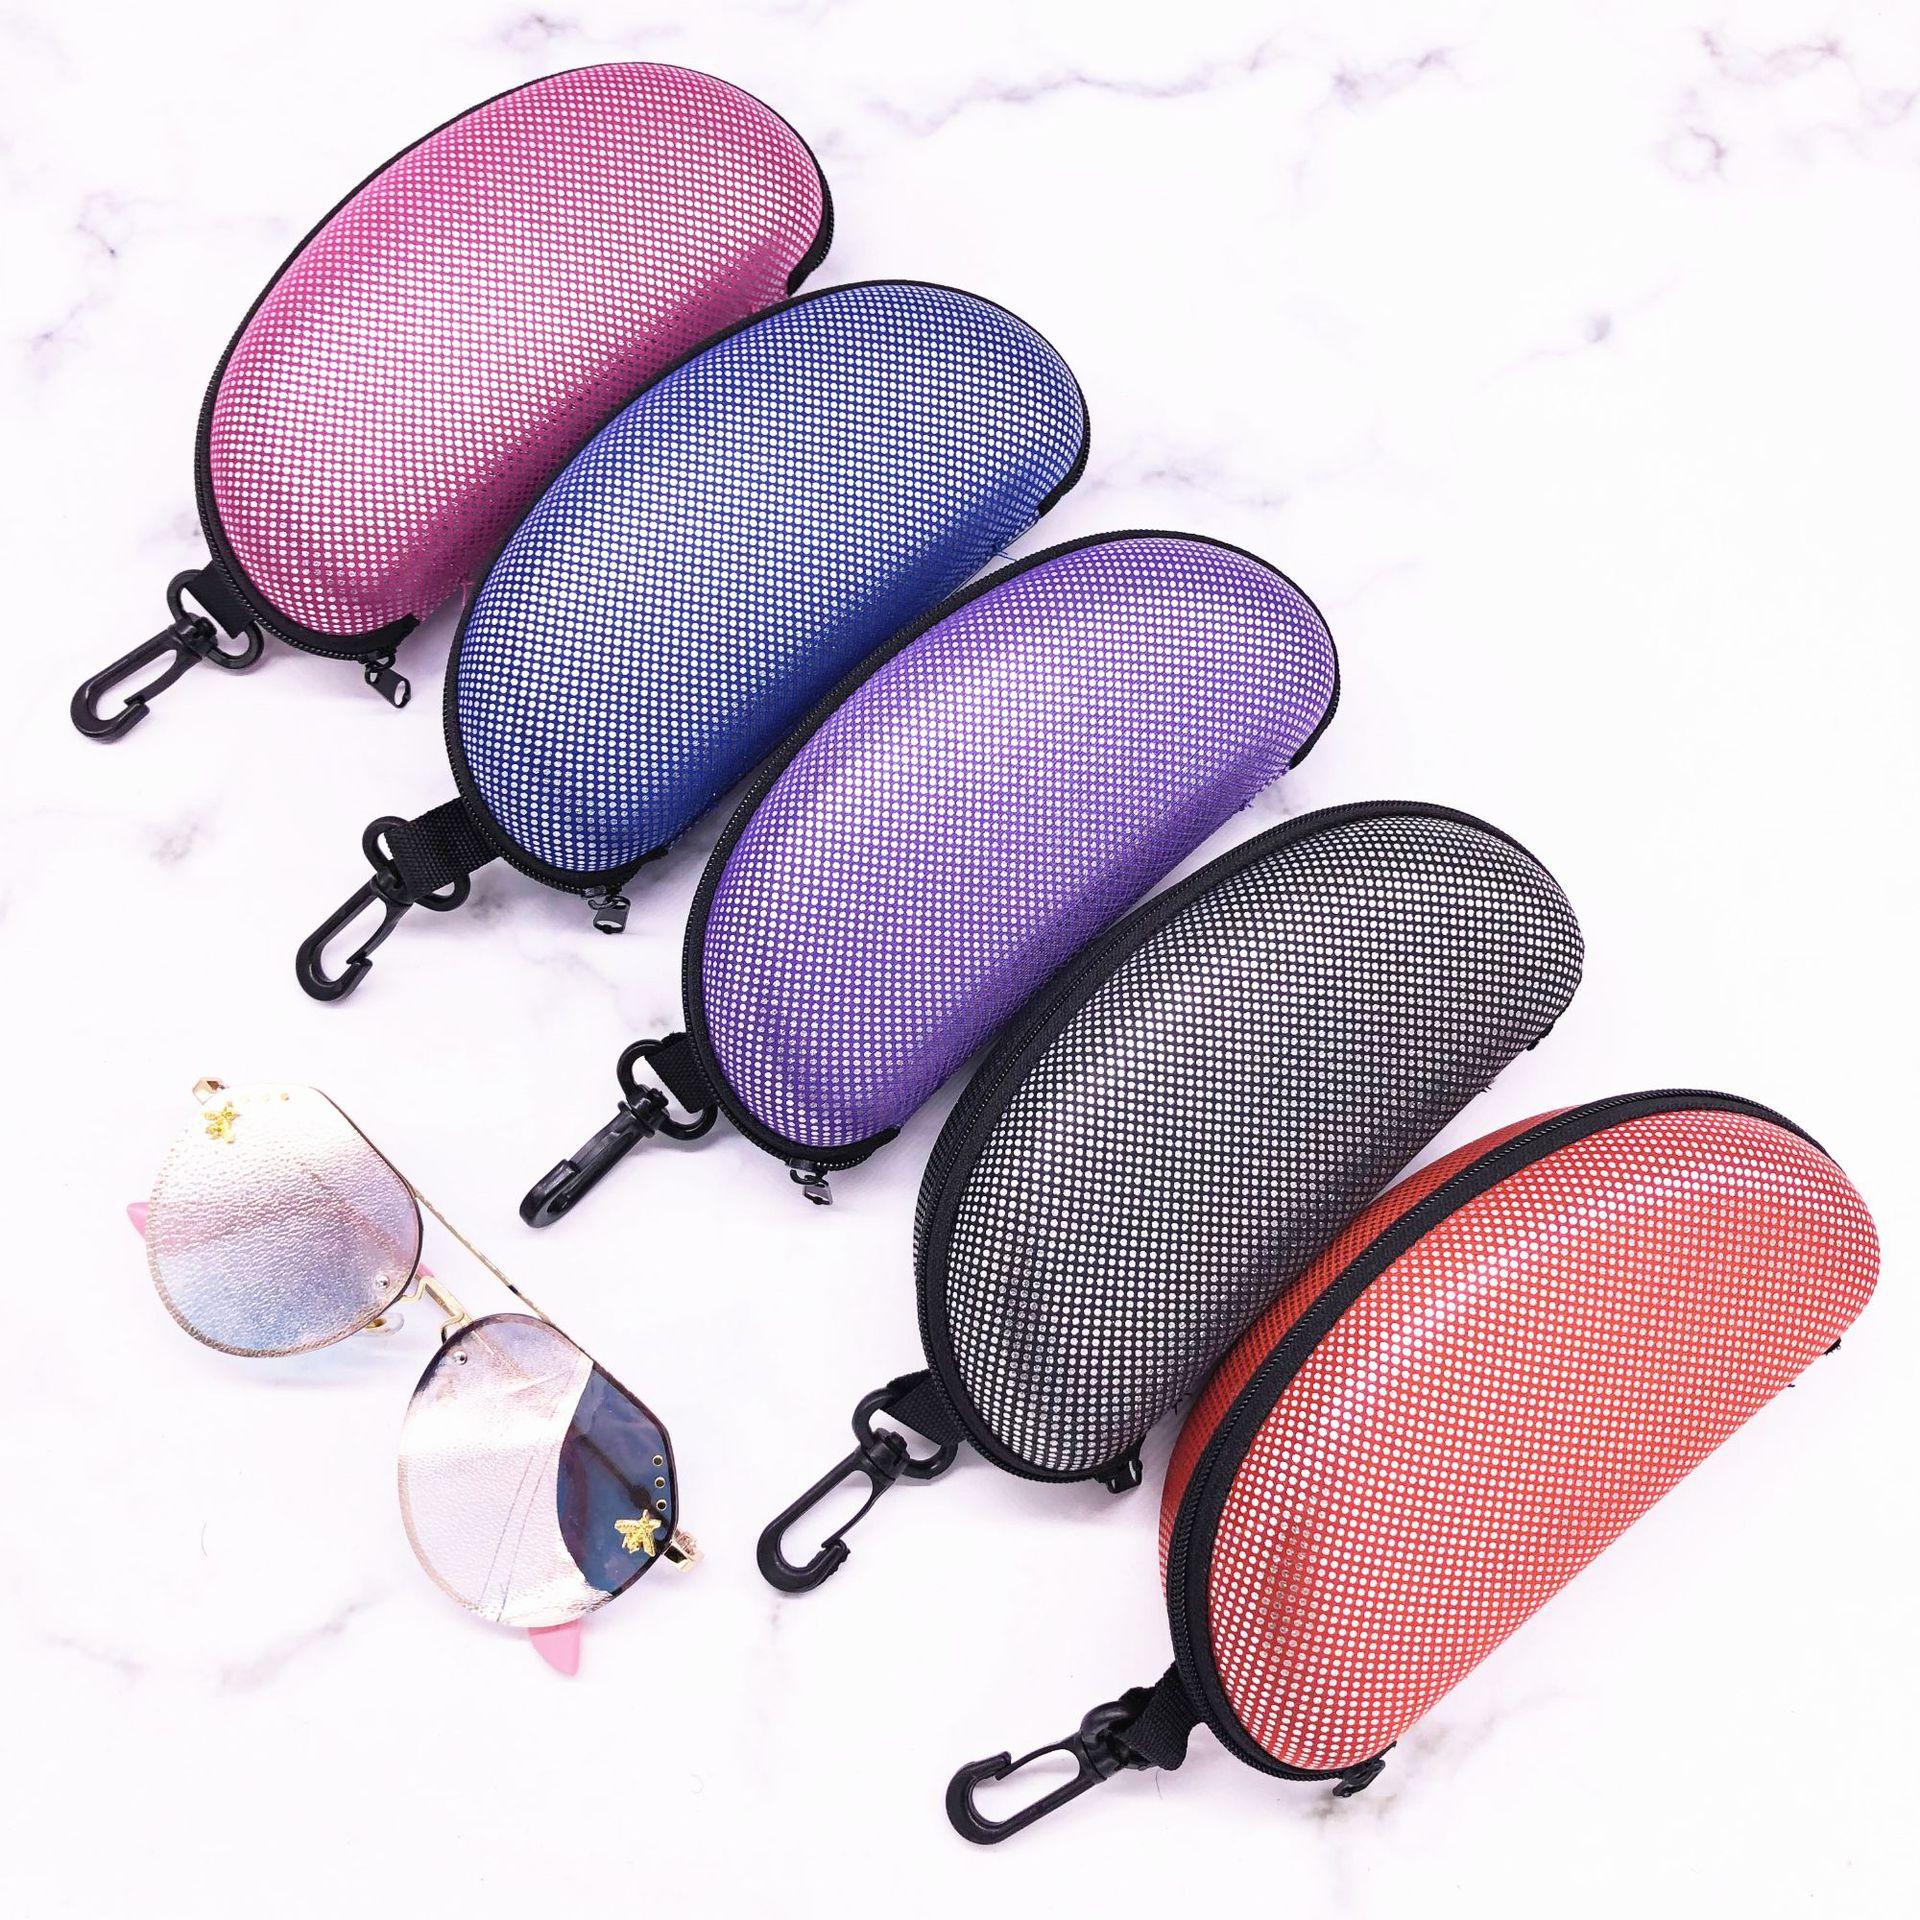 Vikenner Cute Car Shape Hard Zipper Glasses Case Box Nylon Eye Glasses Sunglasses Carry Bag Travel Eyewear Protector for Baby and Toddler Green